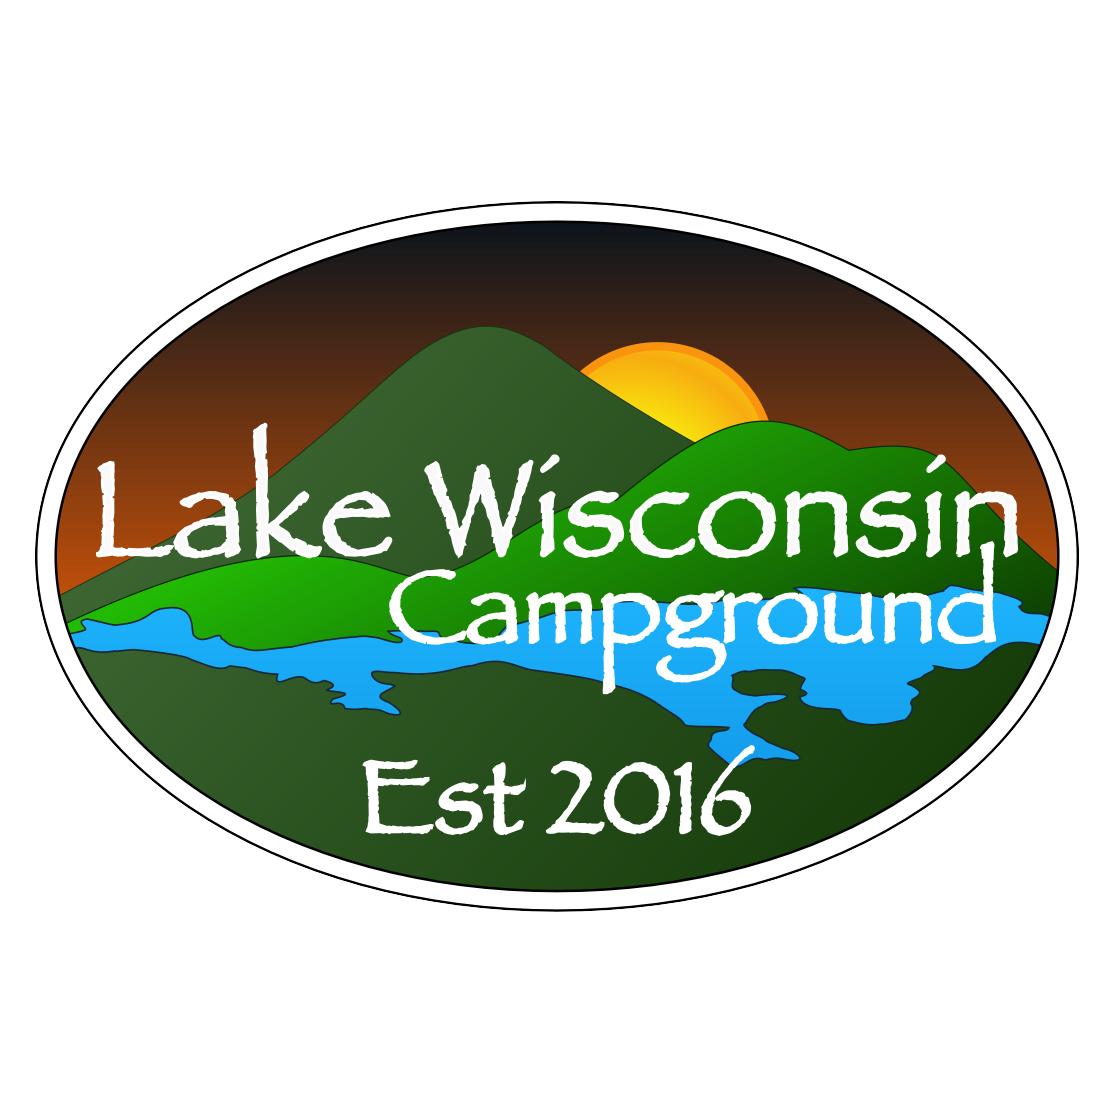 Lake Wisconsin Campground, LLC image 6